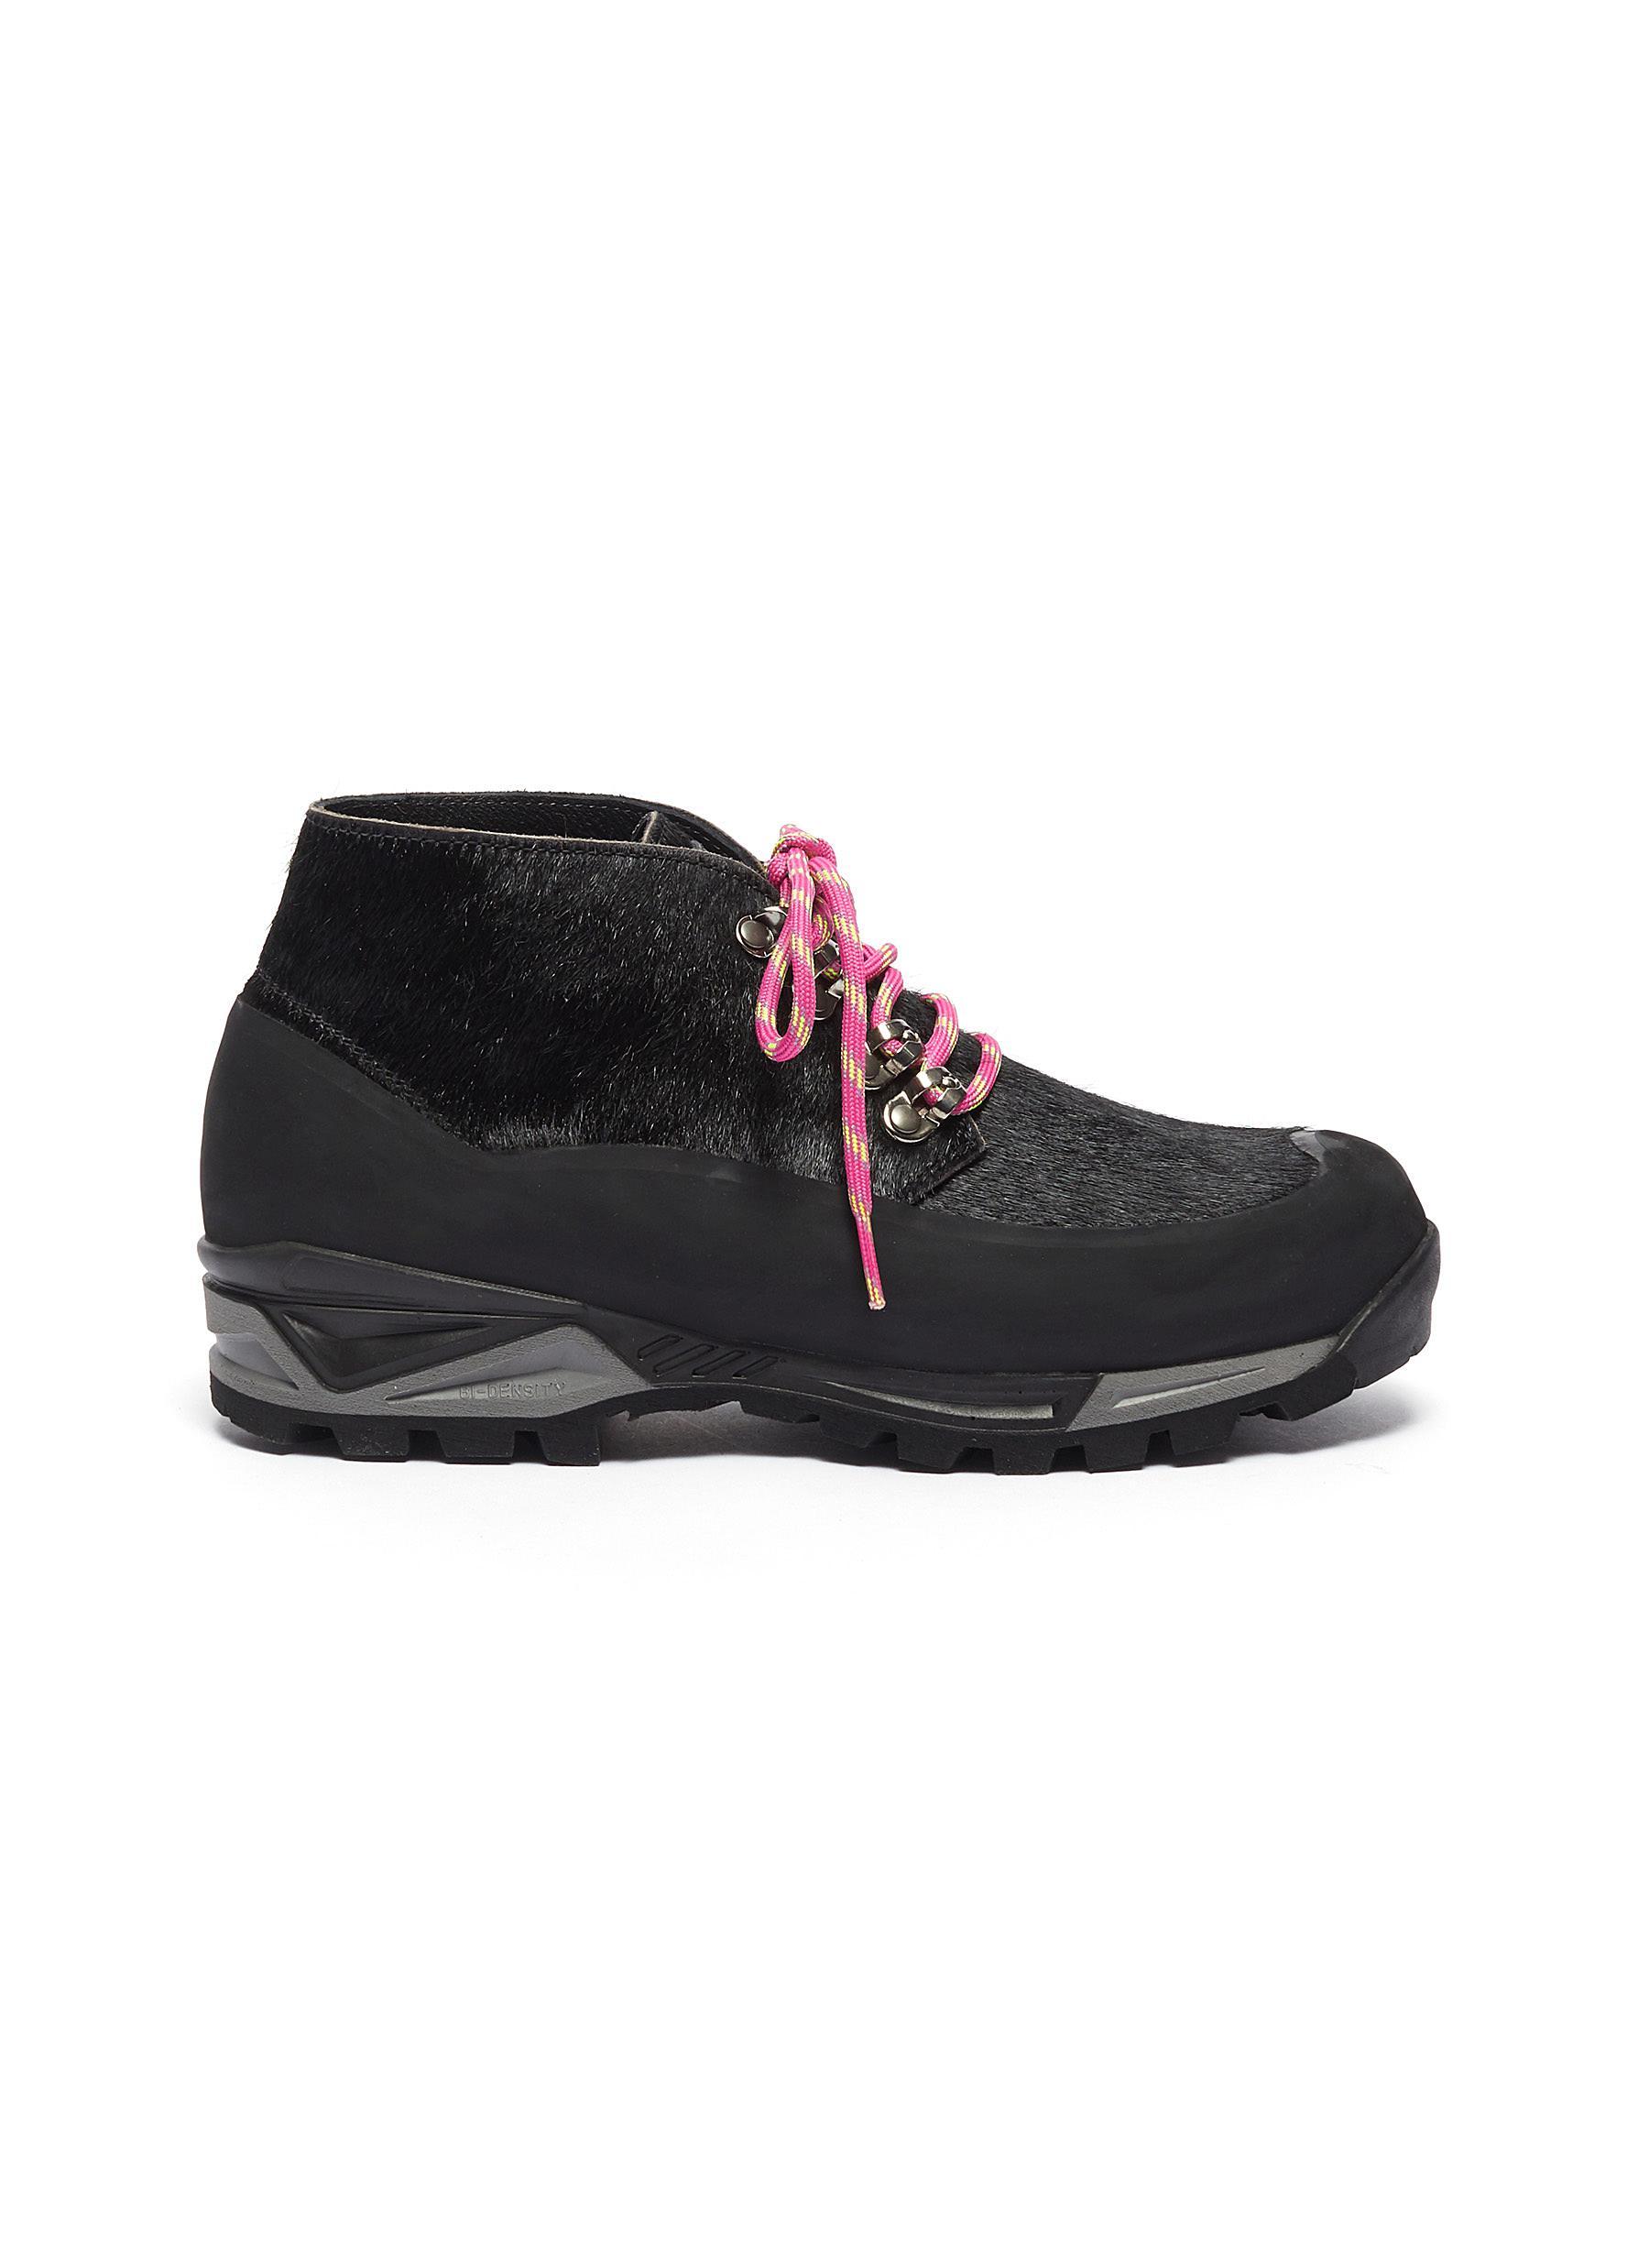 Diemme Sneakers Asiago calf hair chunky hiker boots